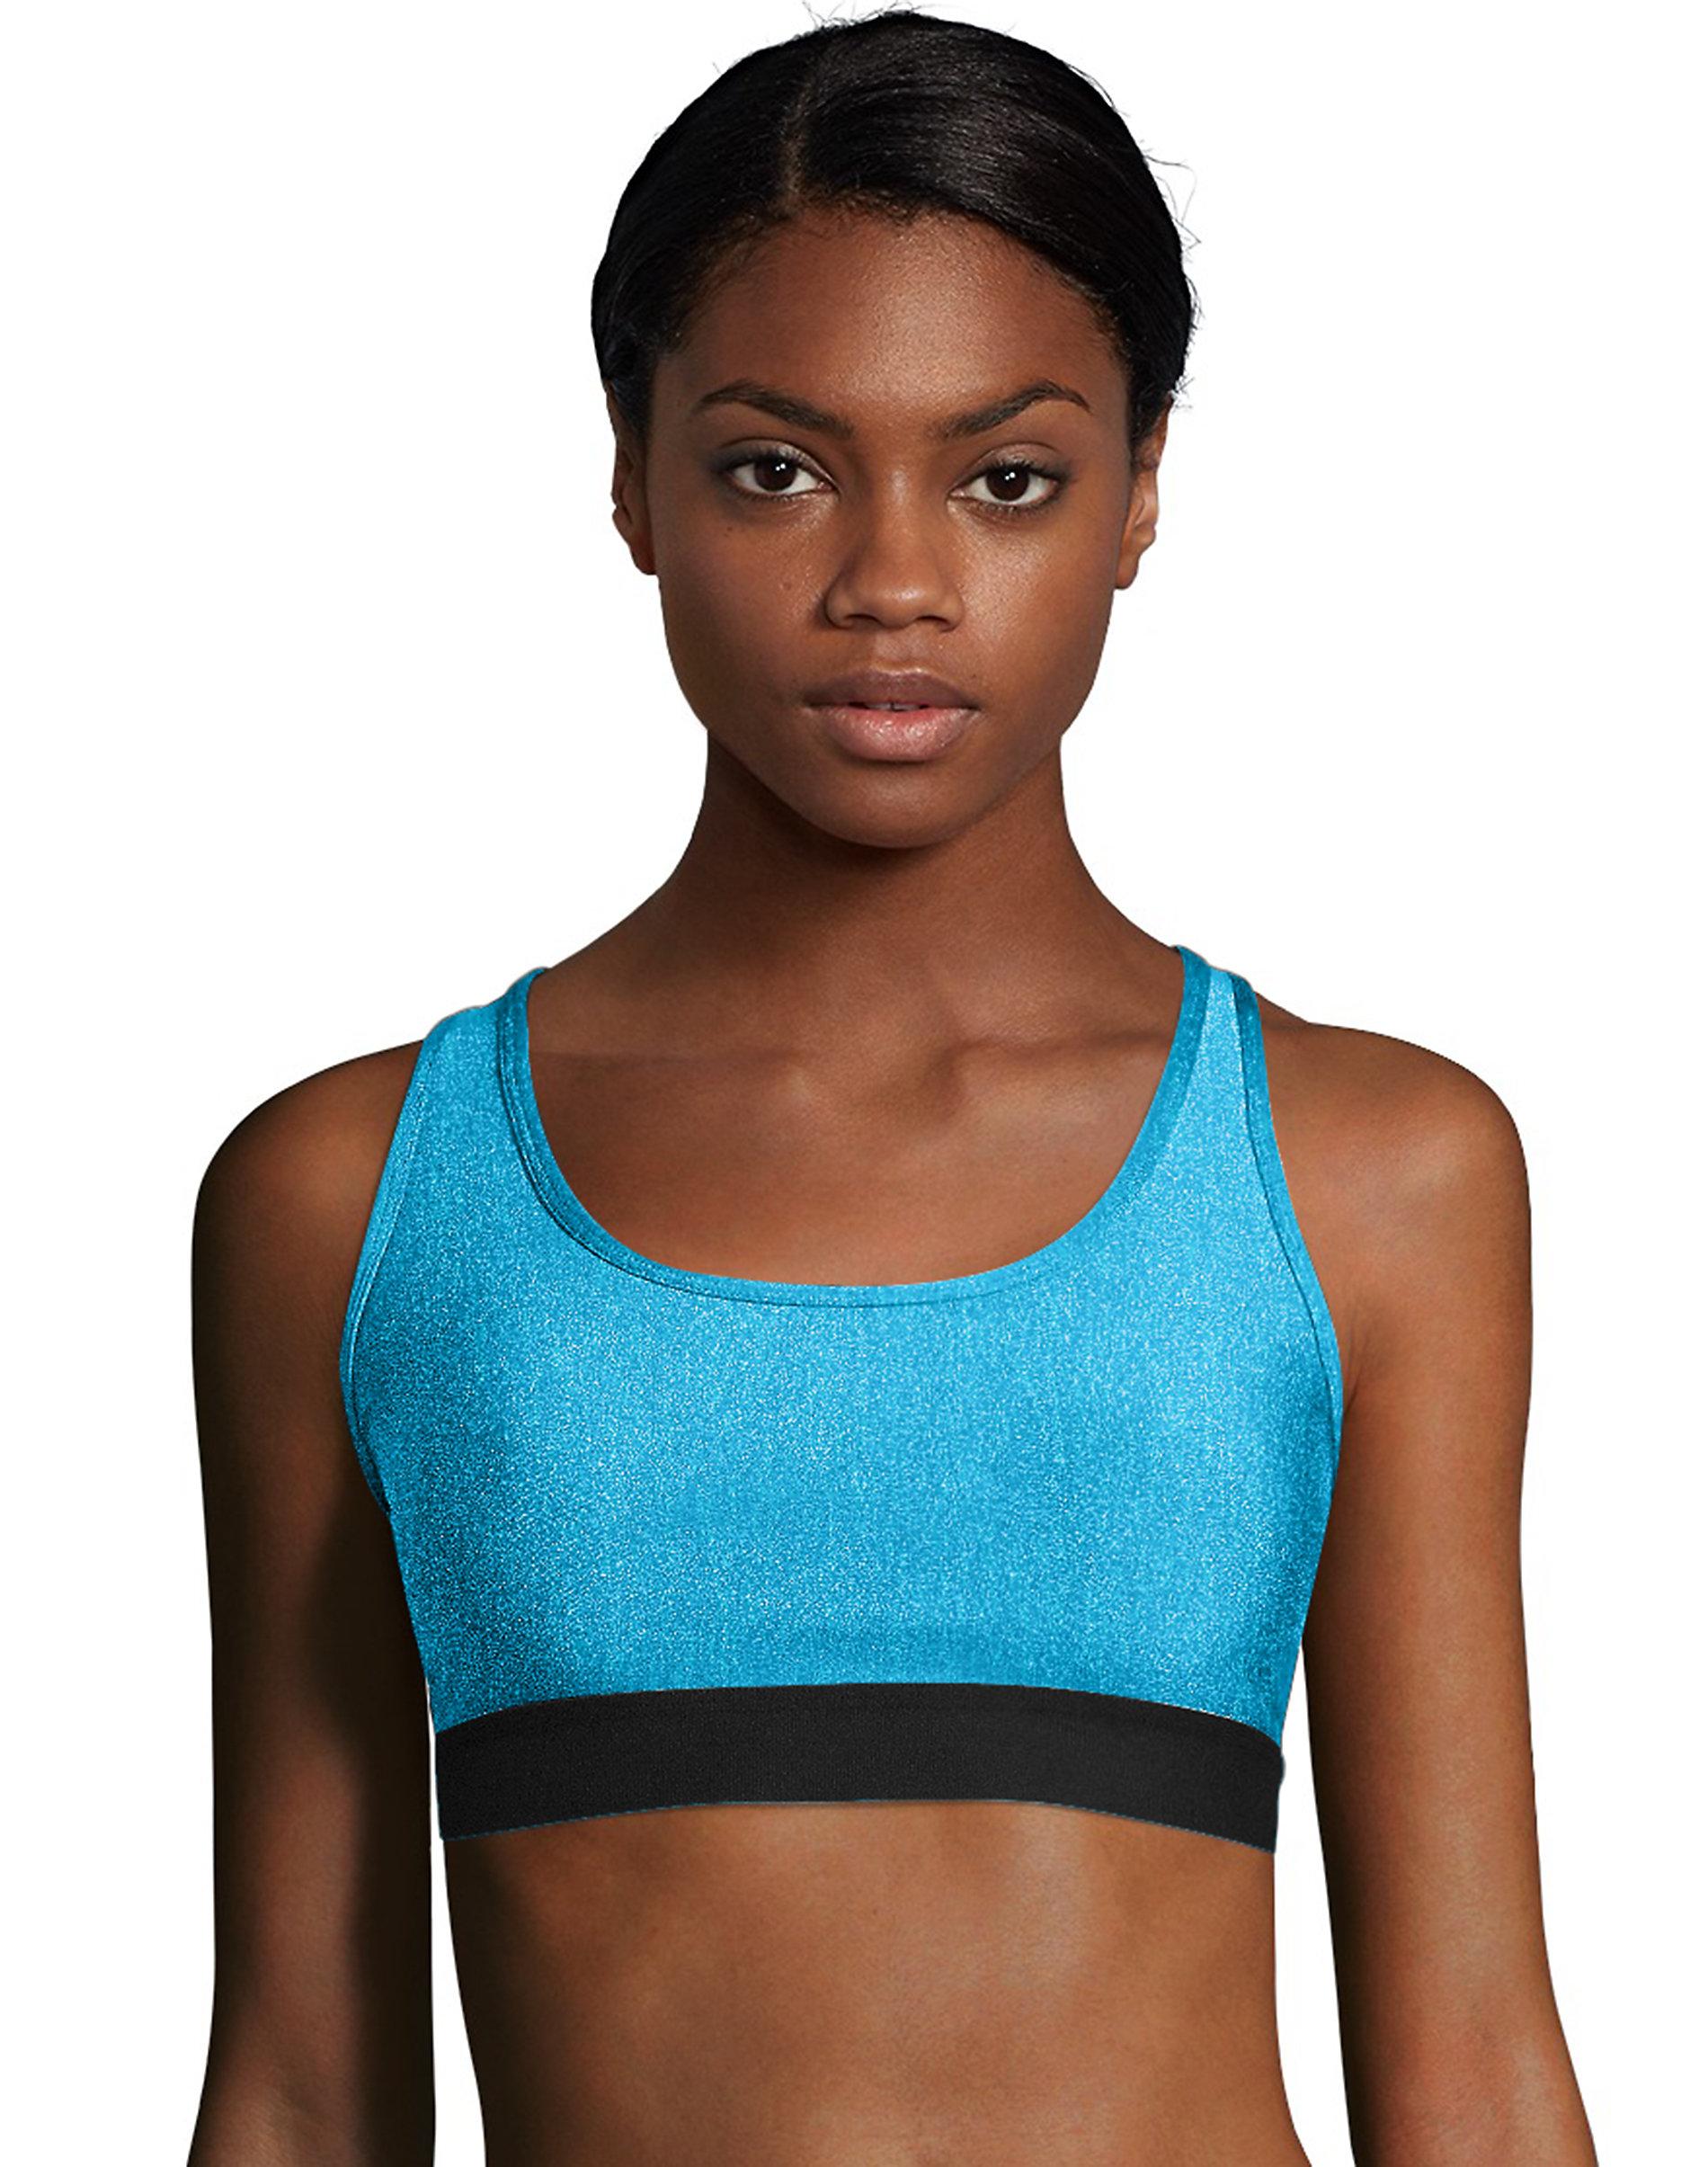 Hanes Women's Sports Bra Racerback Compression Activewear Cool Comfort Running